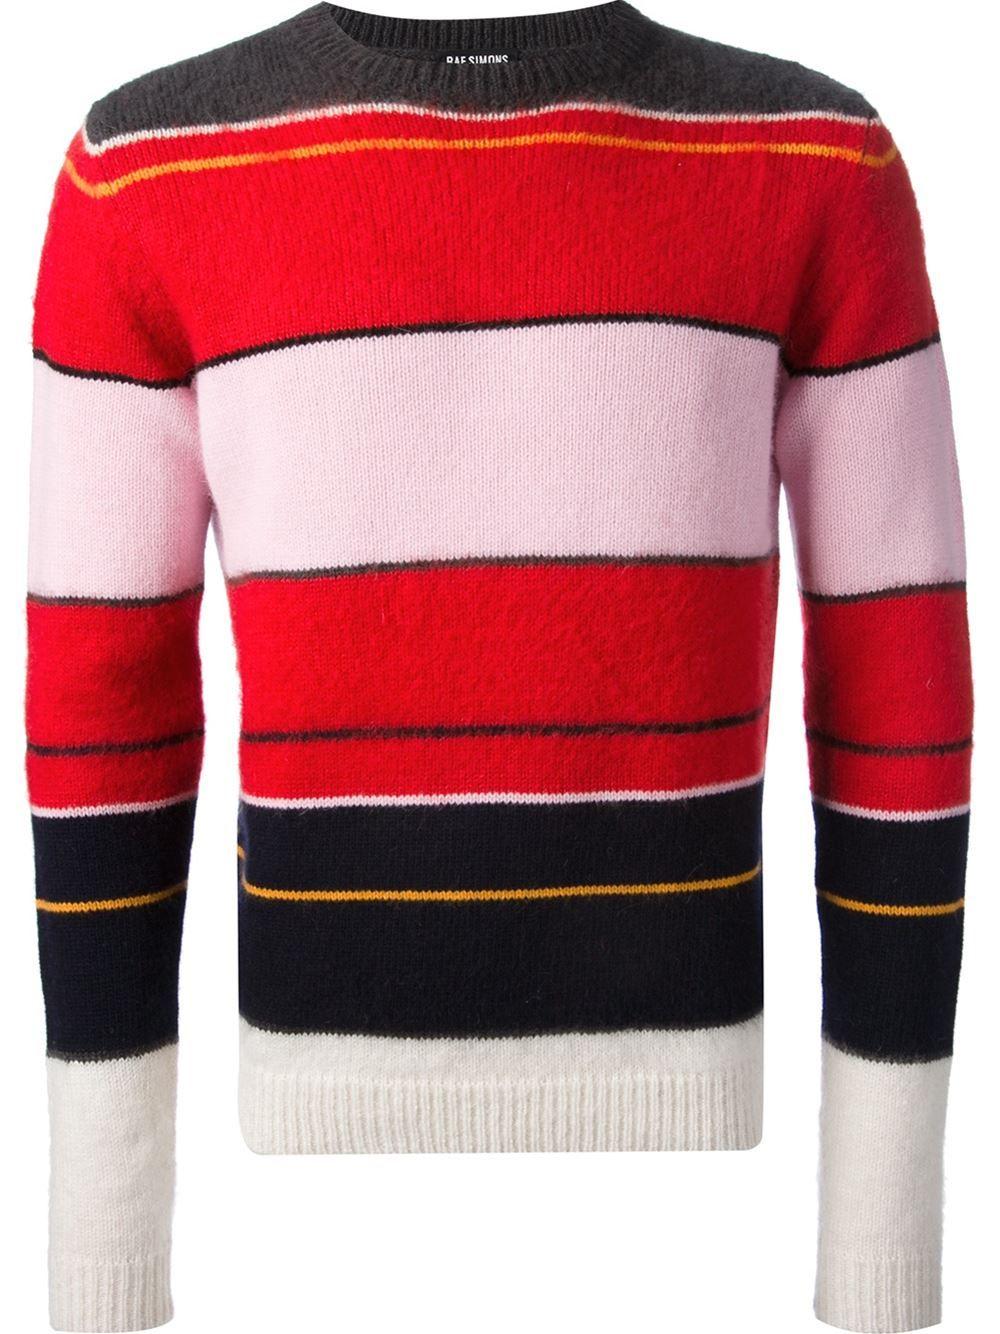 61ad9f3fce6 Mens Designer Clothing · Collar Pattern · http   www.farfetch .com shopping item10499876.aspx